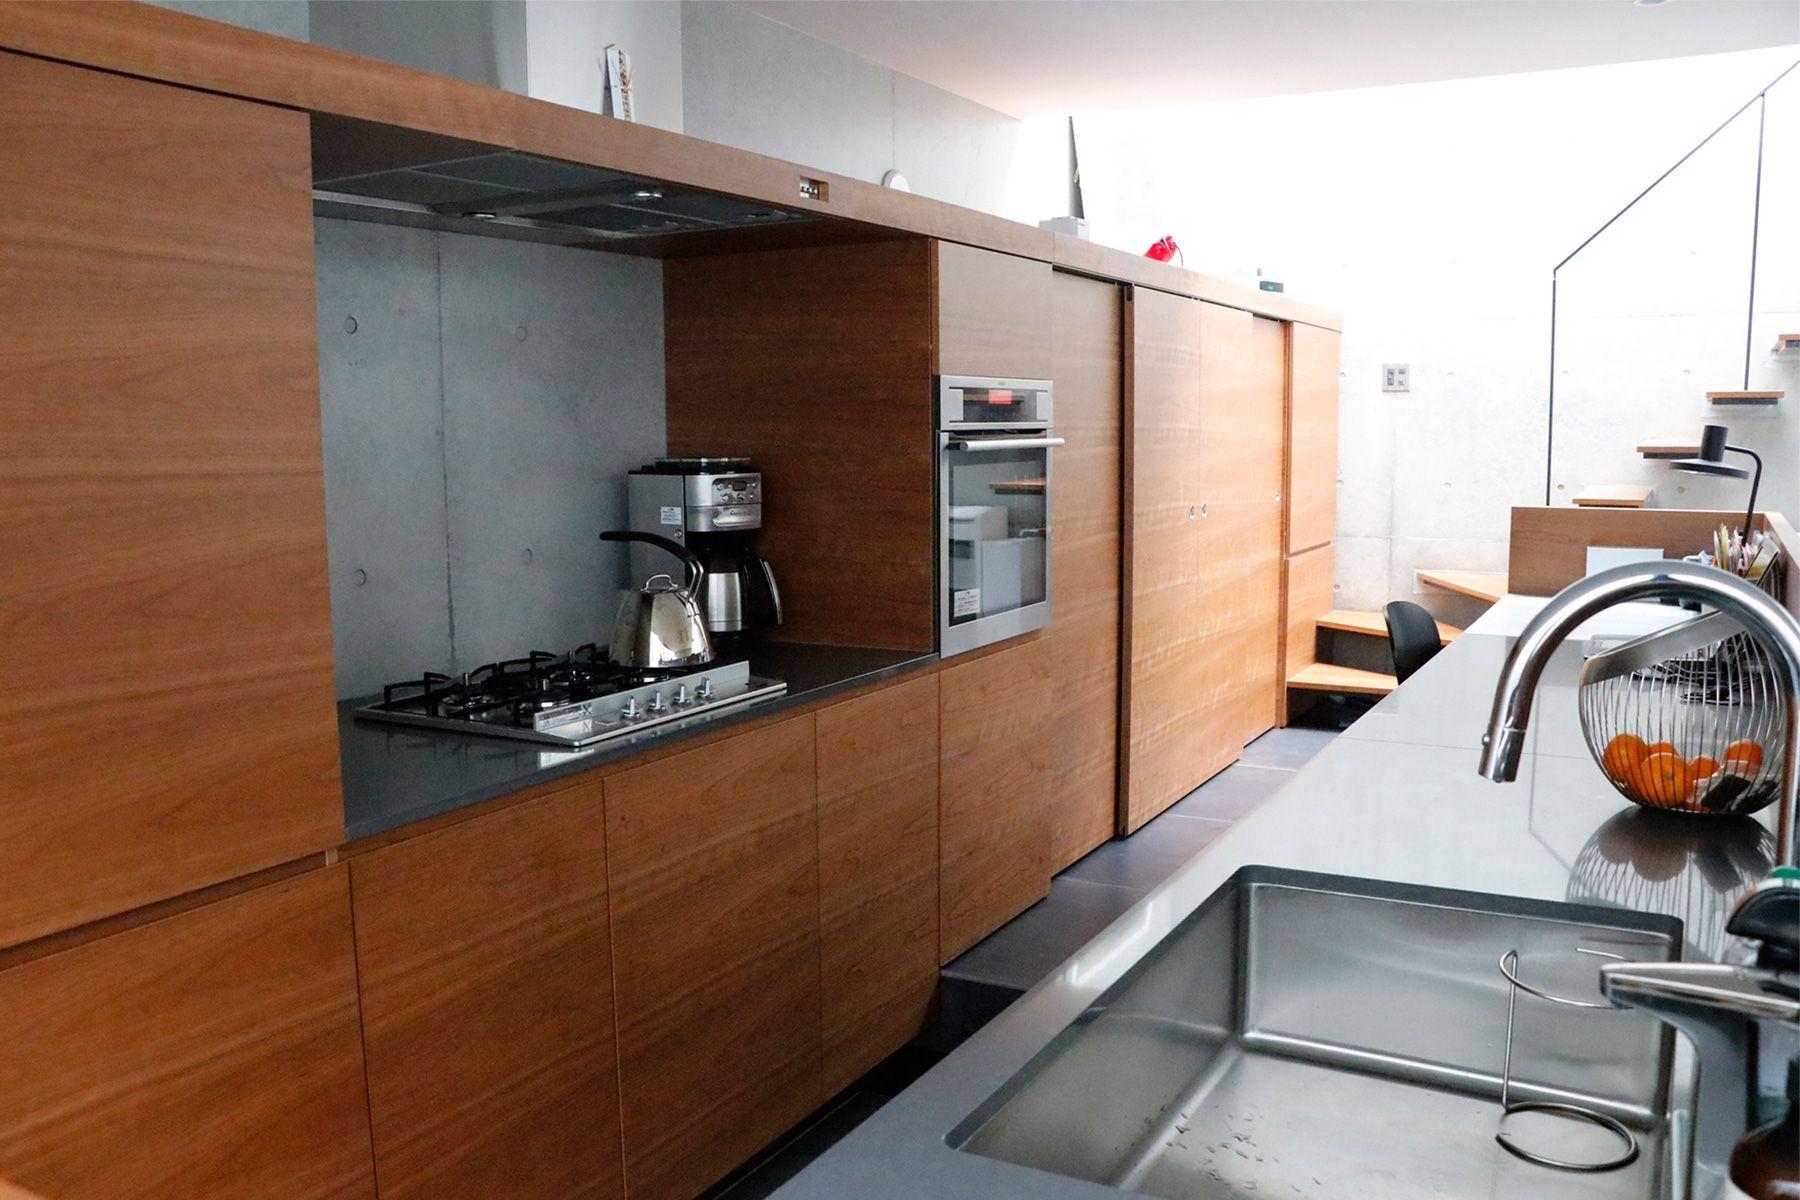 Oliva/個人宅(オリヴァ)キッチン